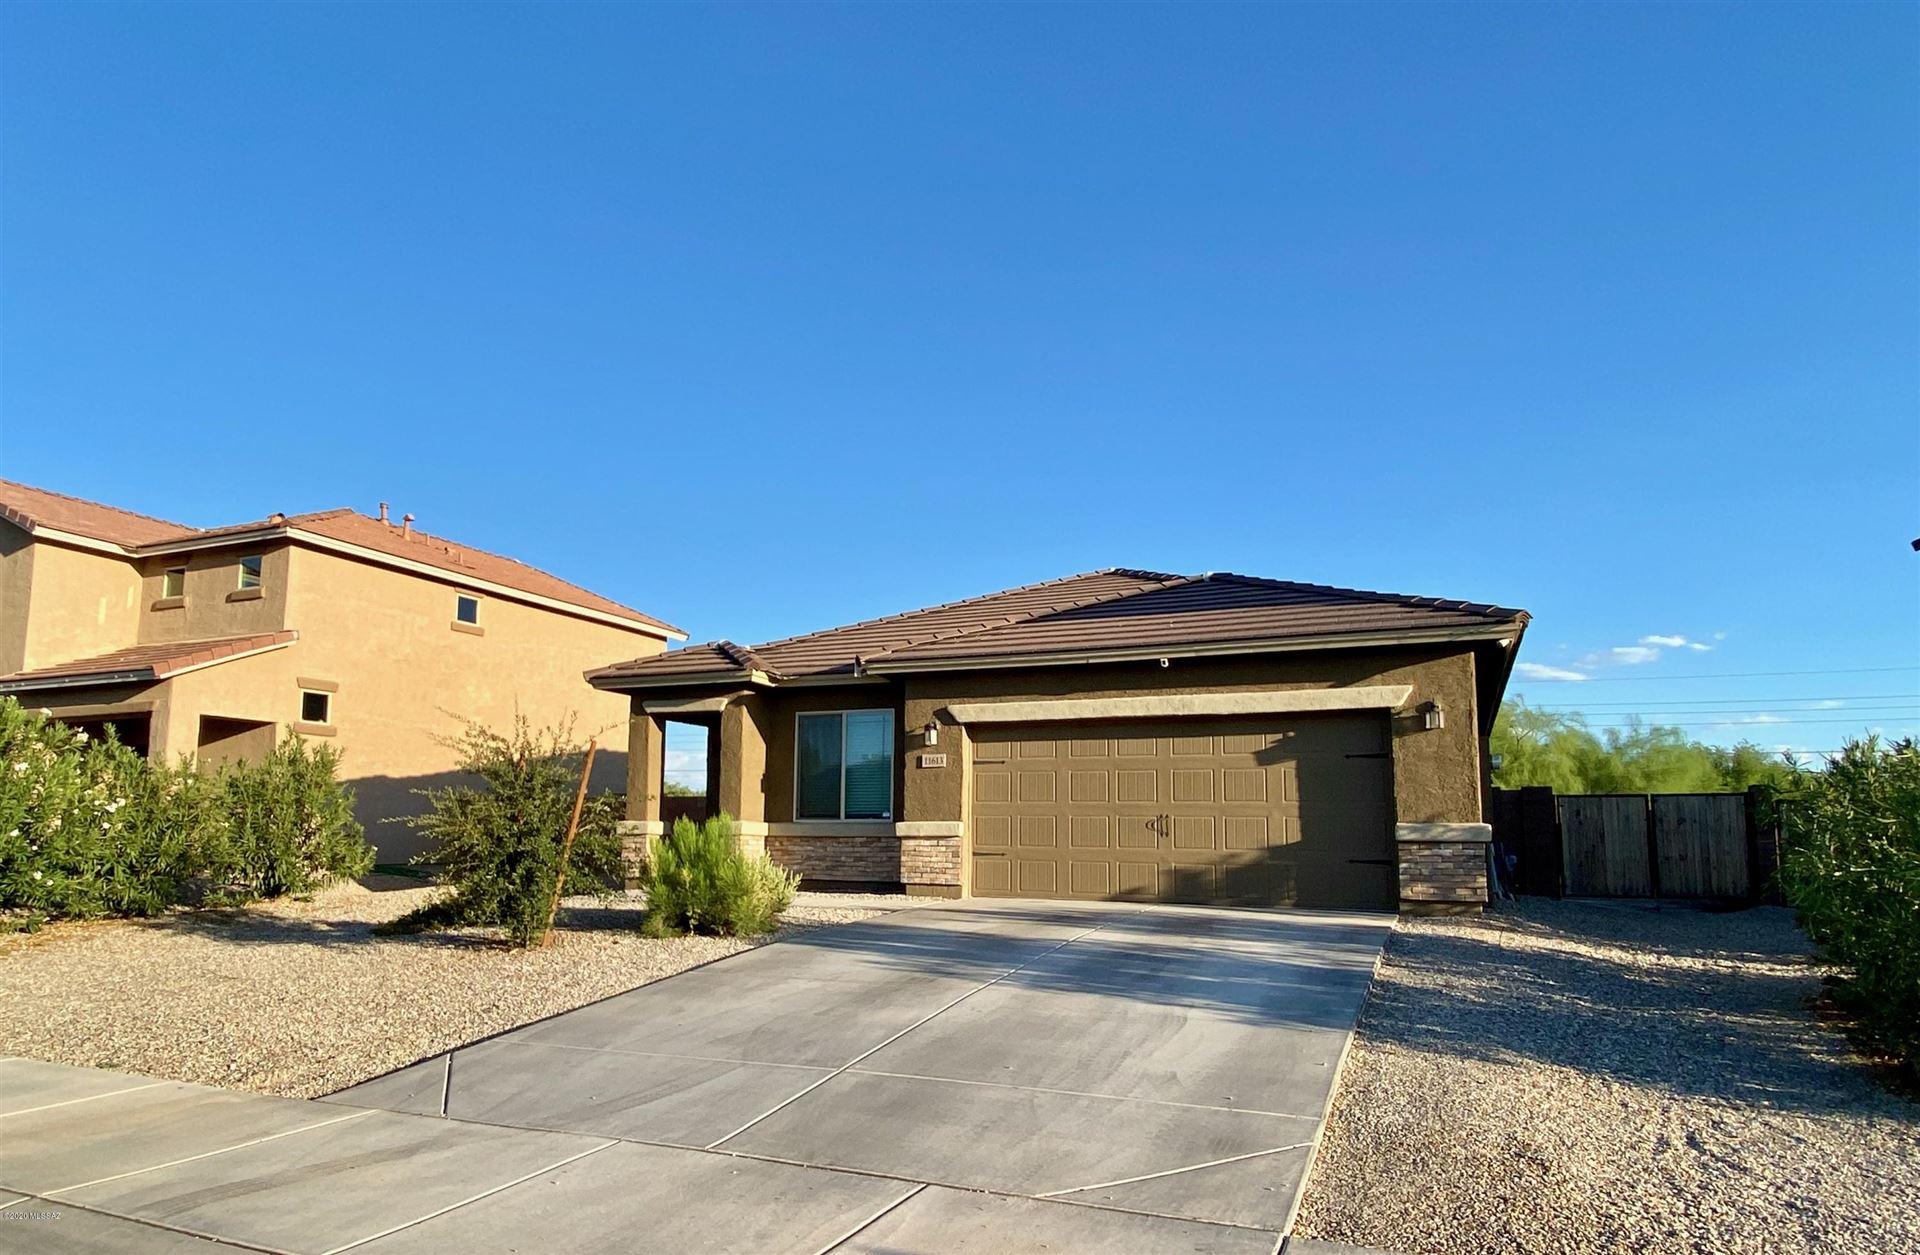 11613 W Vanderbilt Farms Way, Marana, AZ 85653 - MLS#: 22019447